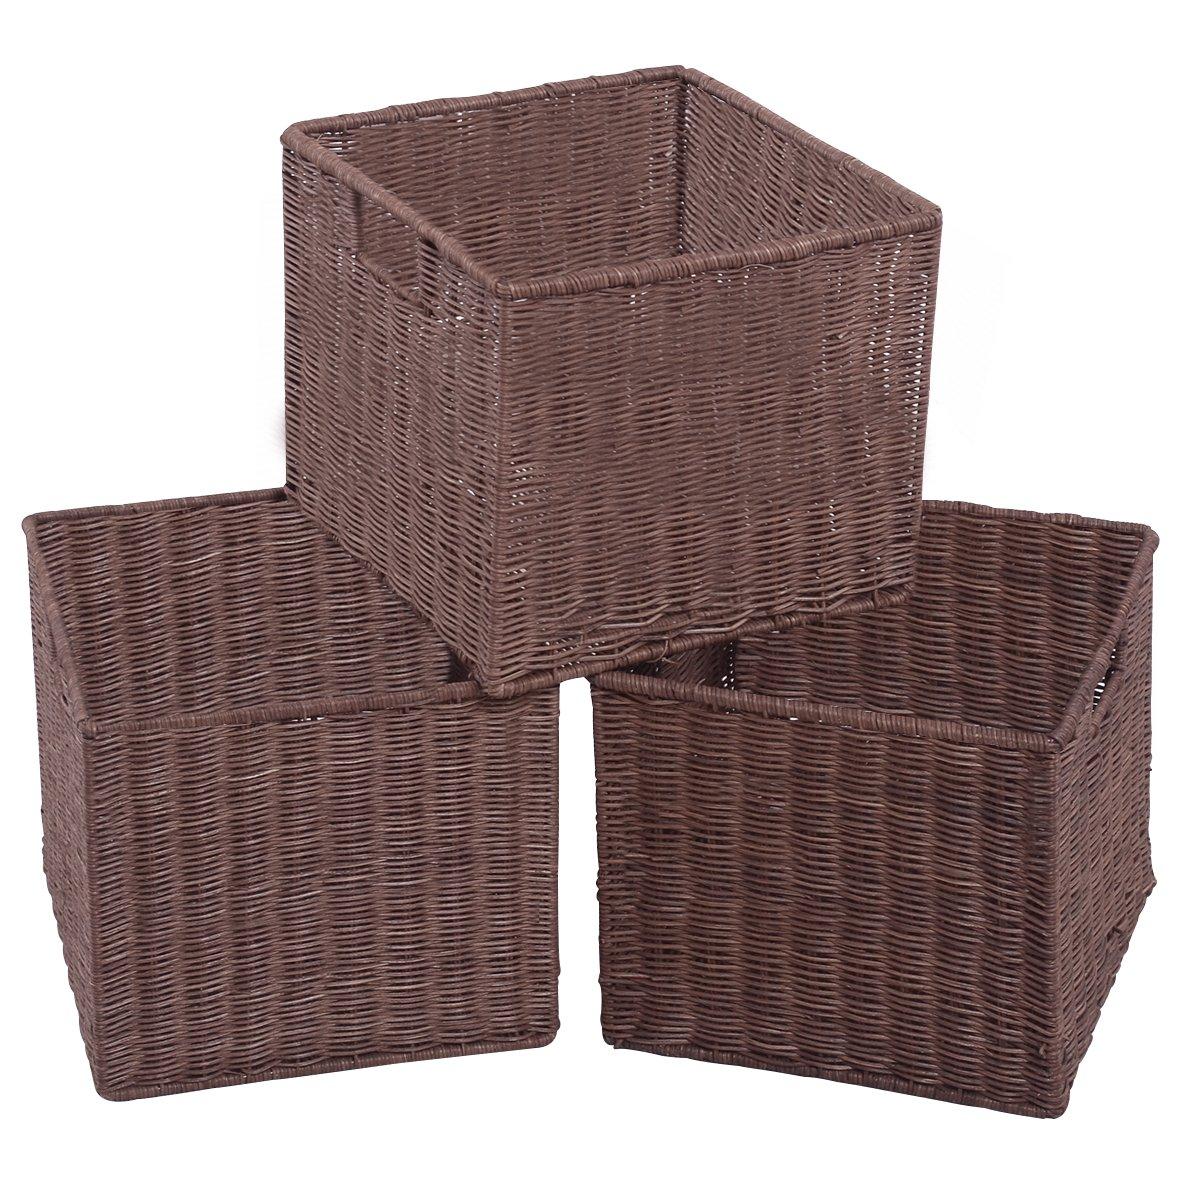 Giantex Set of 3 Wicker Rattan Storage Baskets Nest Nesting Cube Bin Box Organizer Home (3Wicker Rattan Covered)